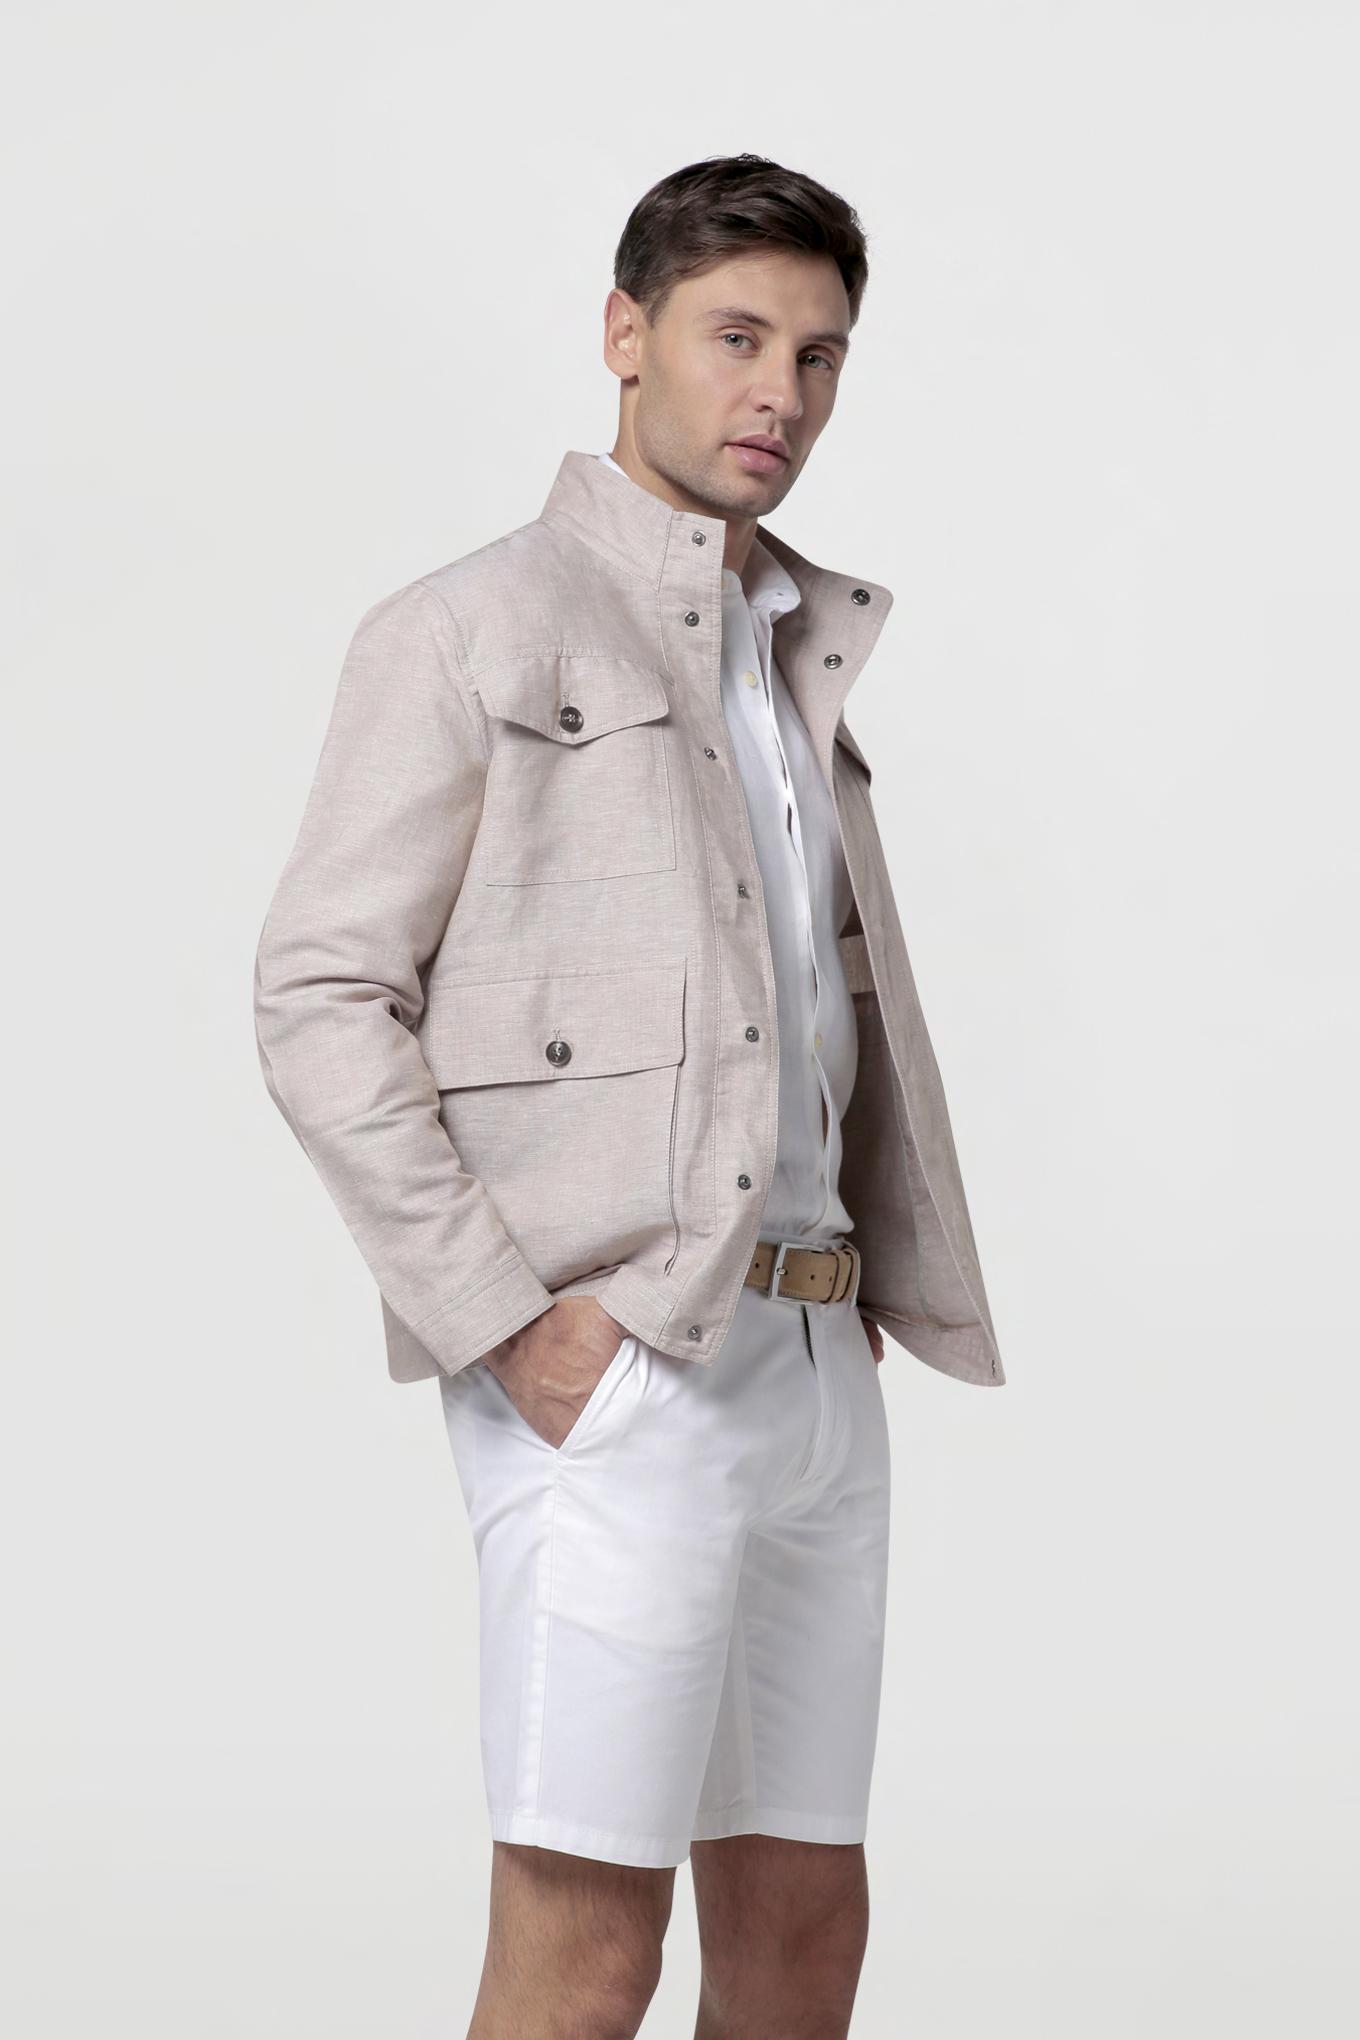 Bermuda White Casual Man